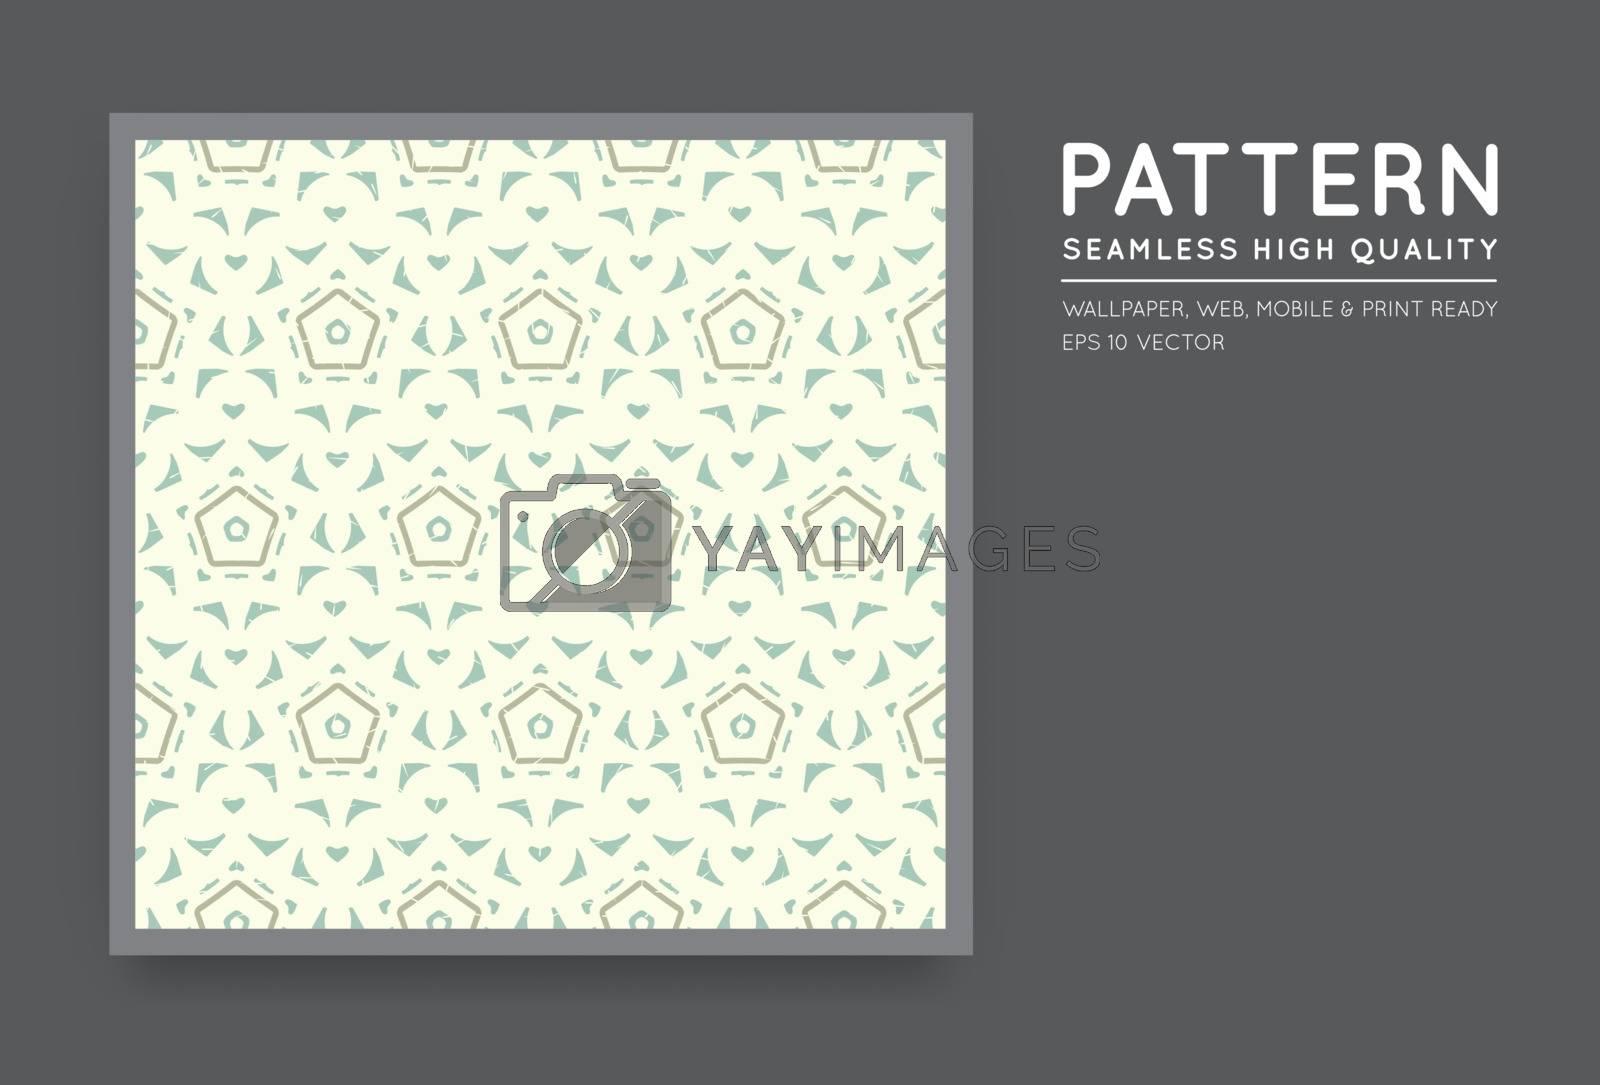 Seamless Vector Arabian Style Abstract Pattern